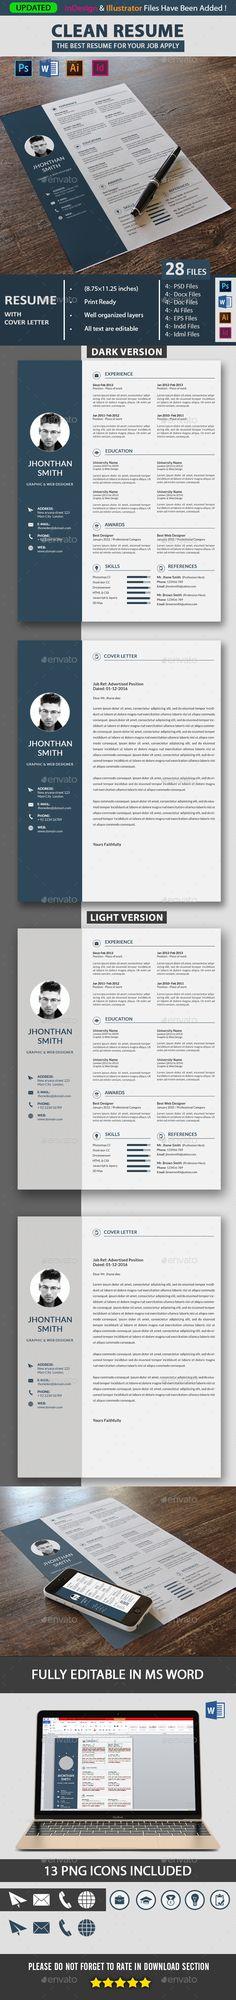 The 81 best Resume images on Pinterest Creative resume, Resume